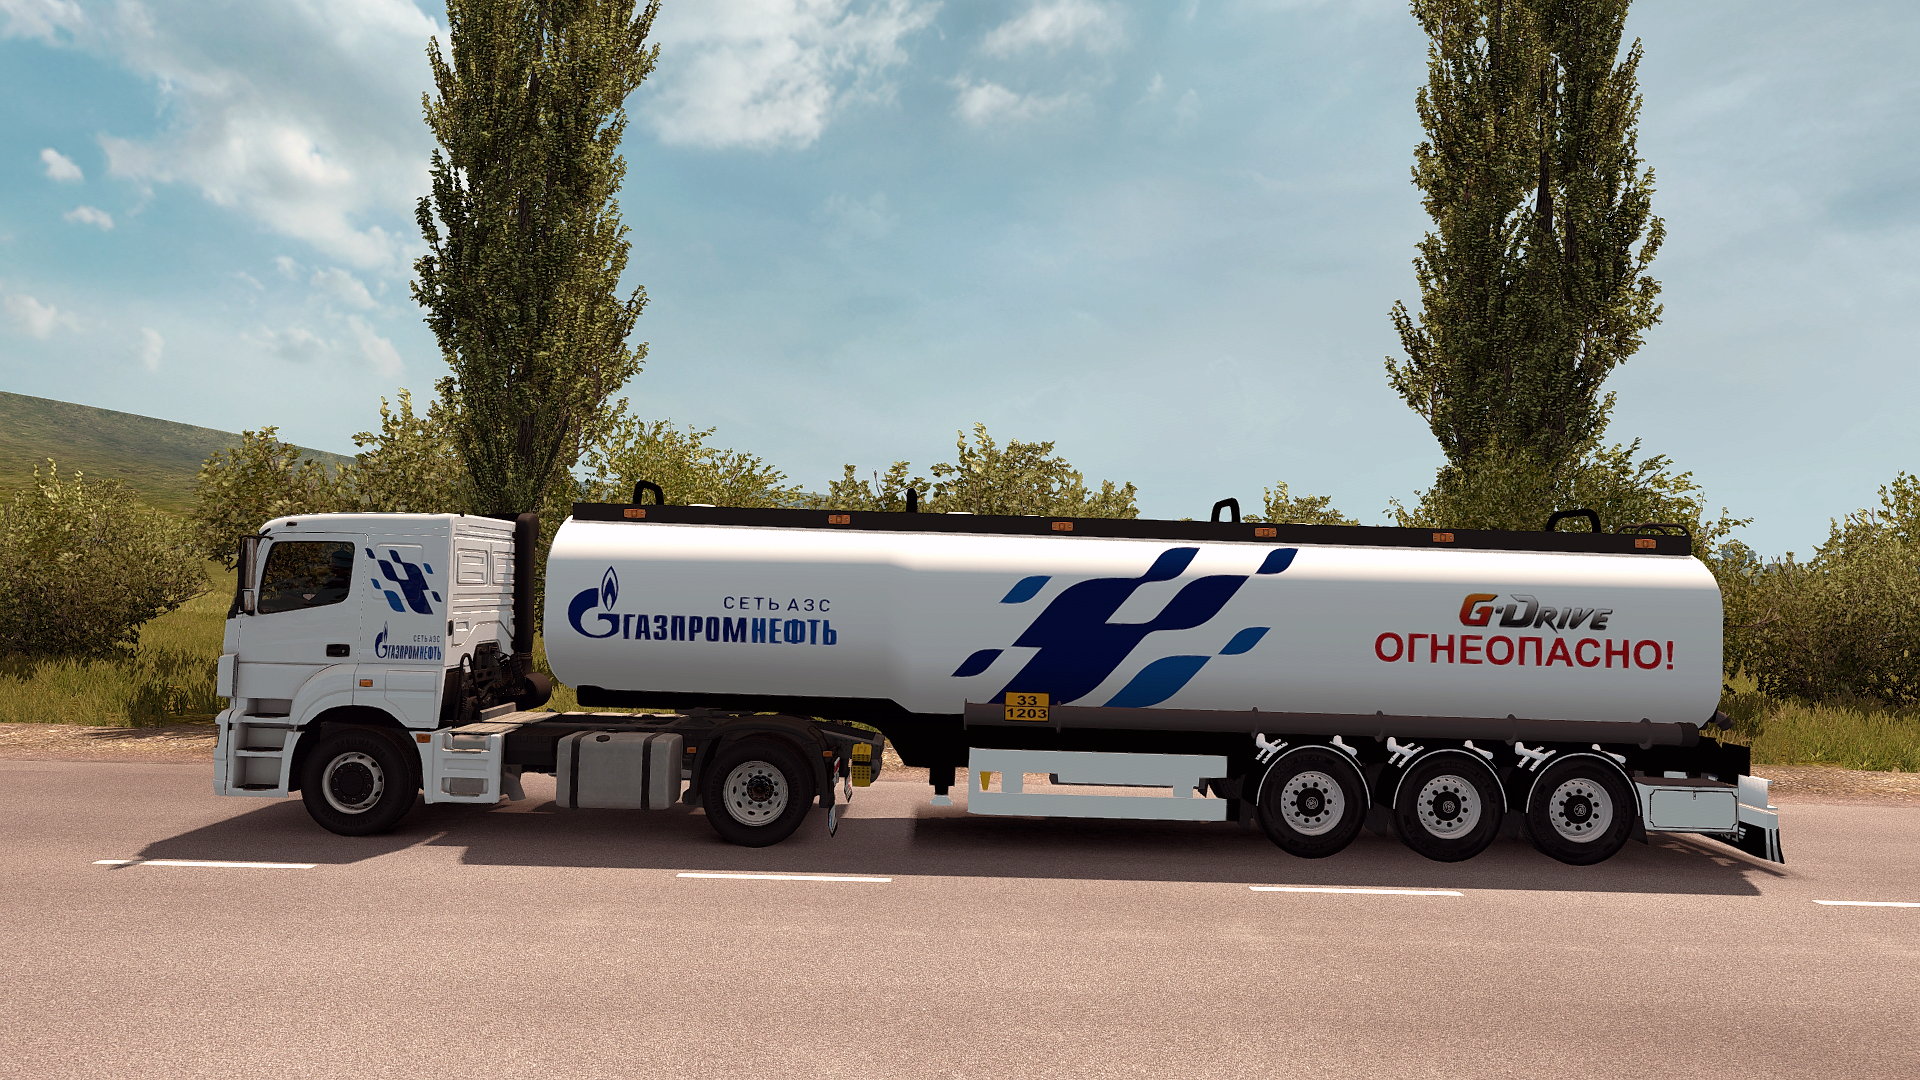 eurotrucks2 2018-04-25 19-12-01.png - Euro Truck Simulator 2 Транспорт